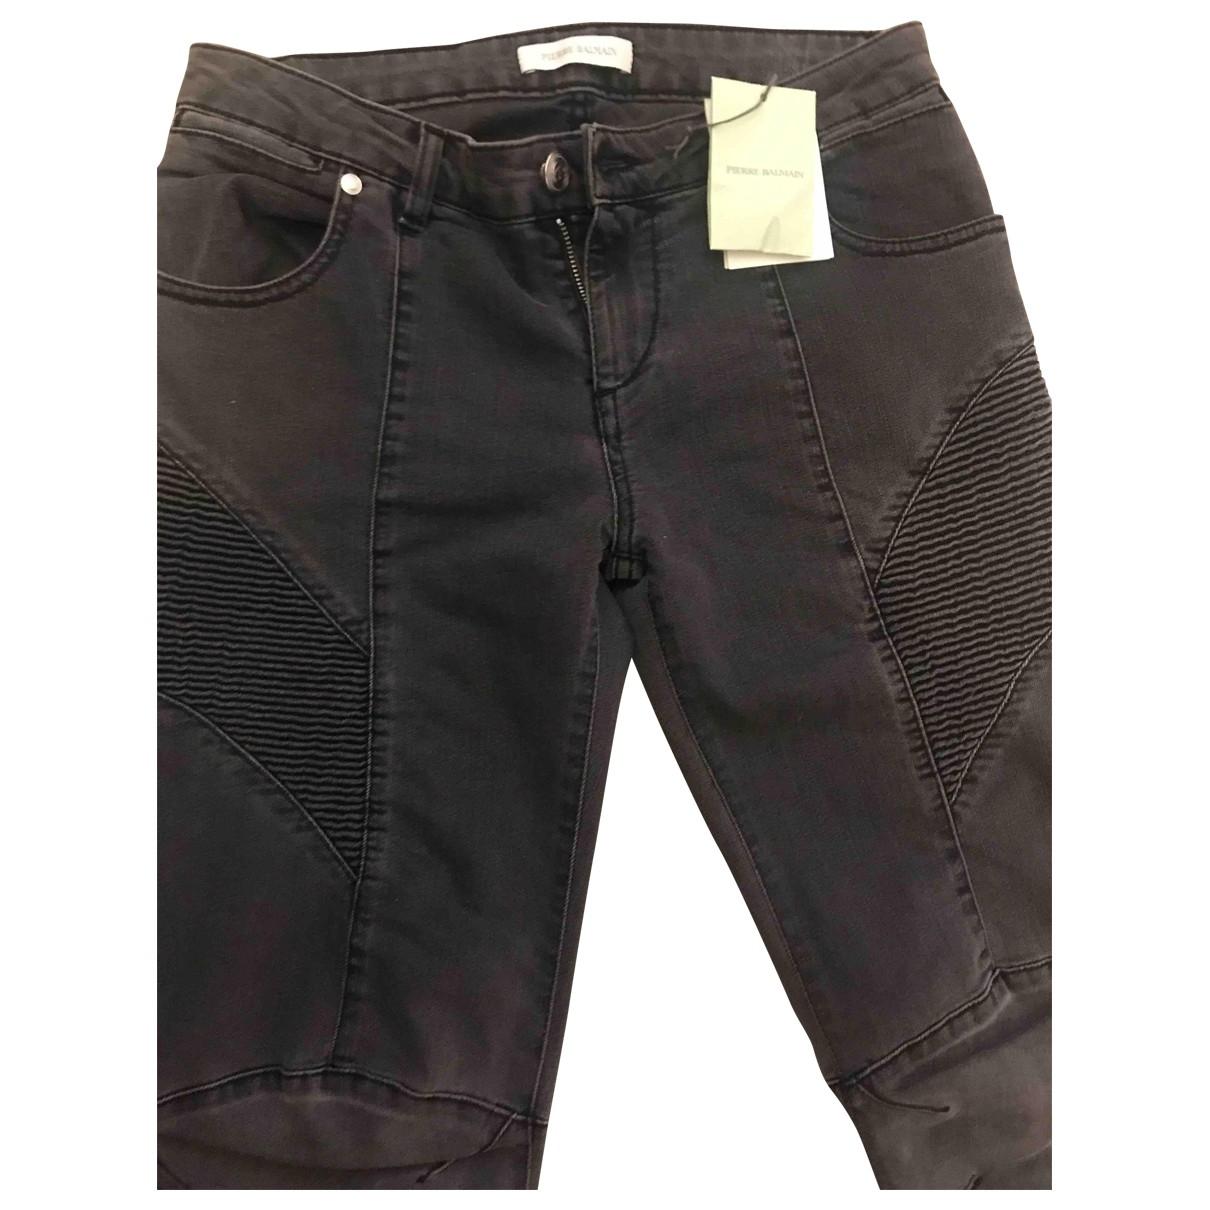 Balmain \N Grey Cotton - elasthane Jeans for Women 38 FR